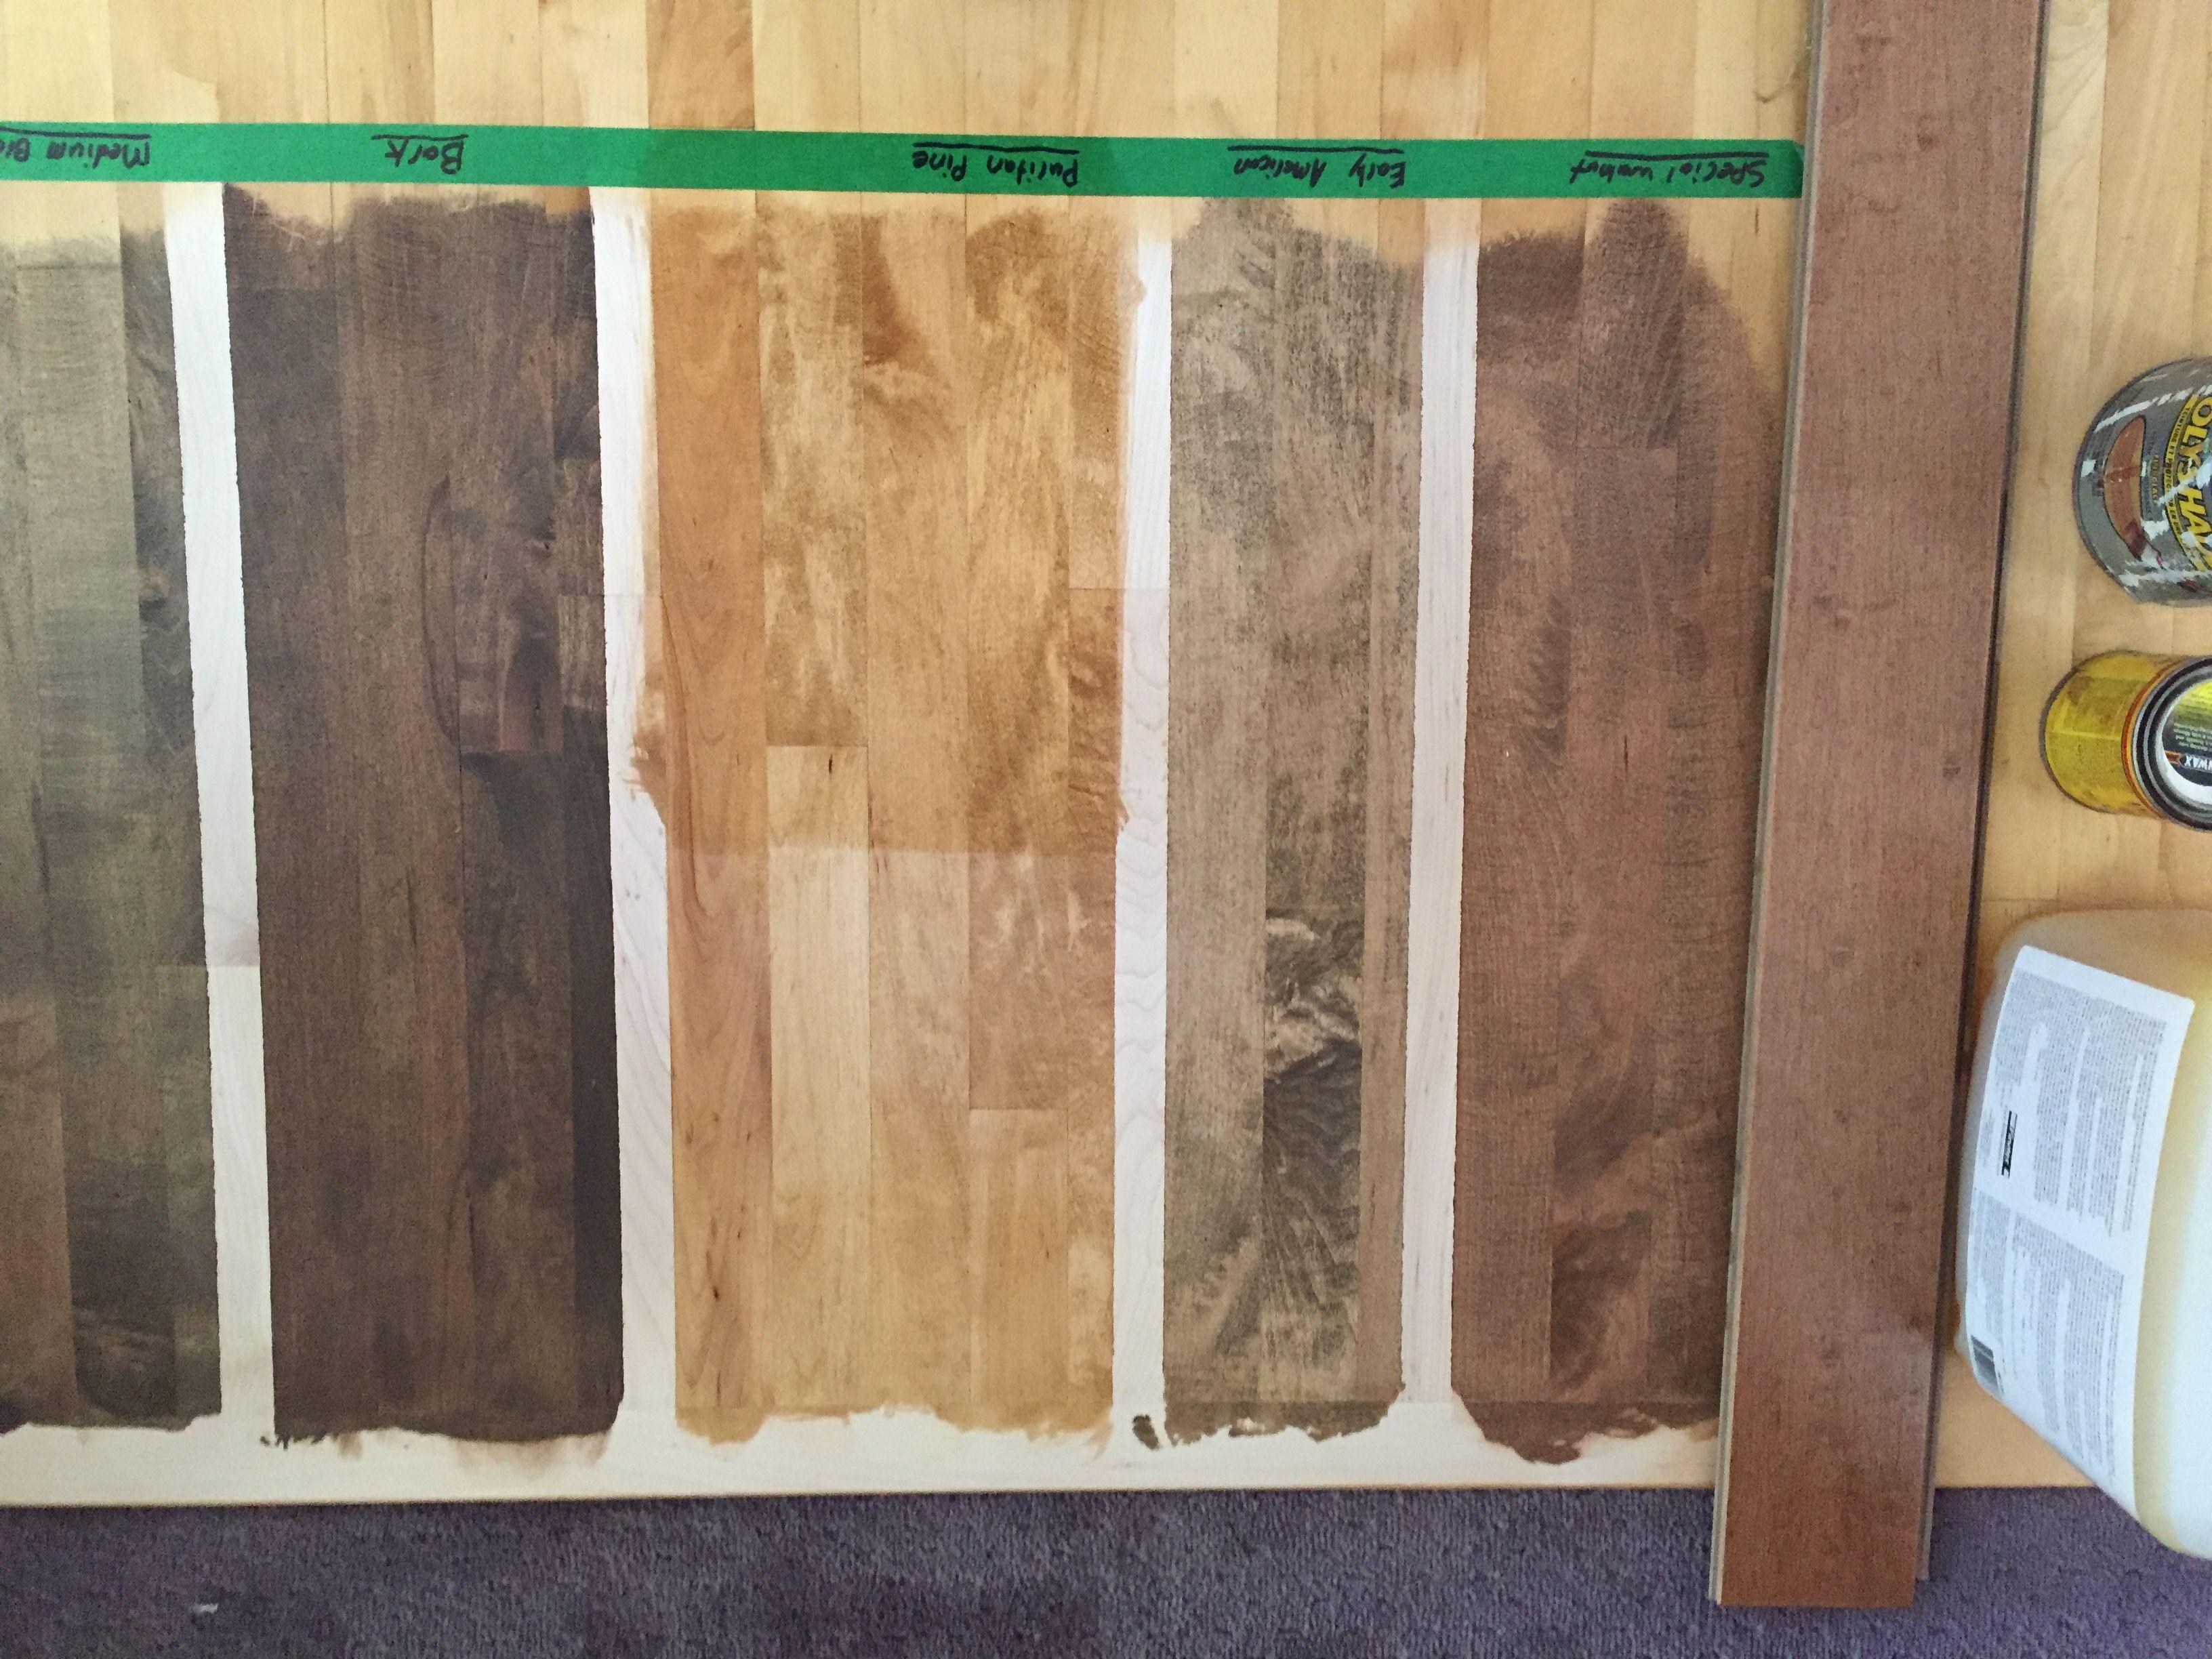 Bona Stain Samples On Maple Maple Floors Staining Wood Wood